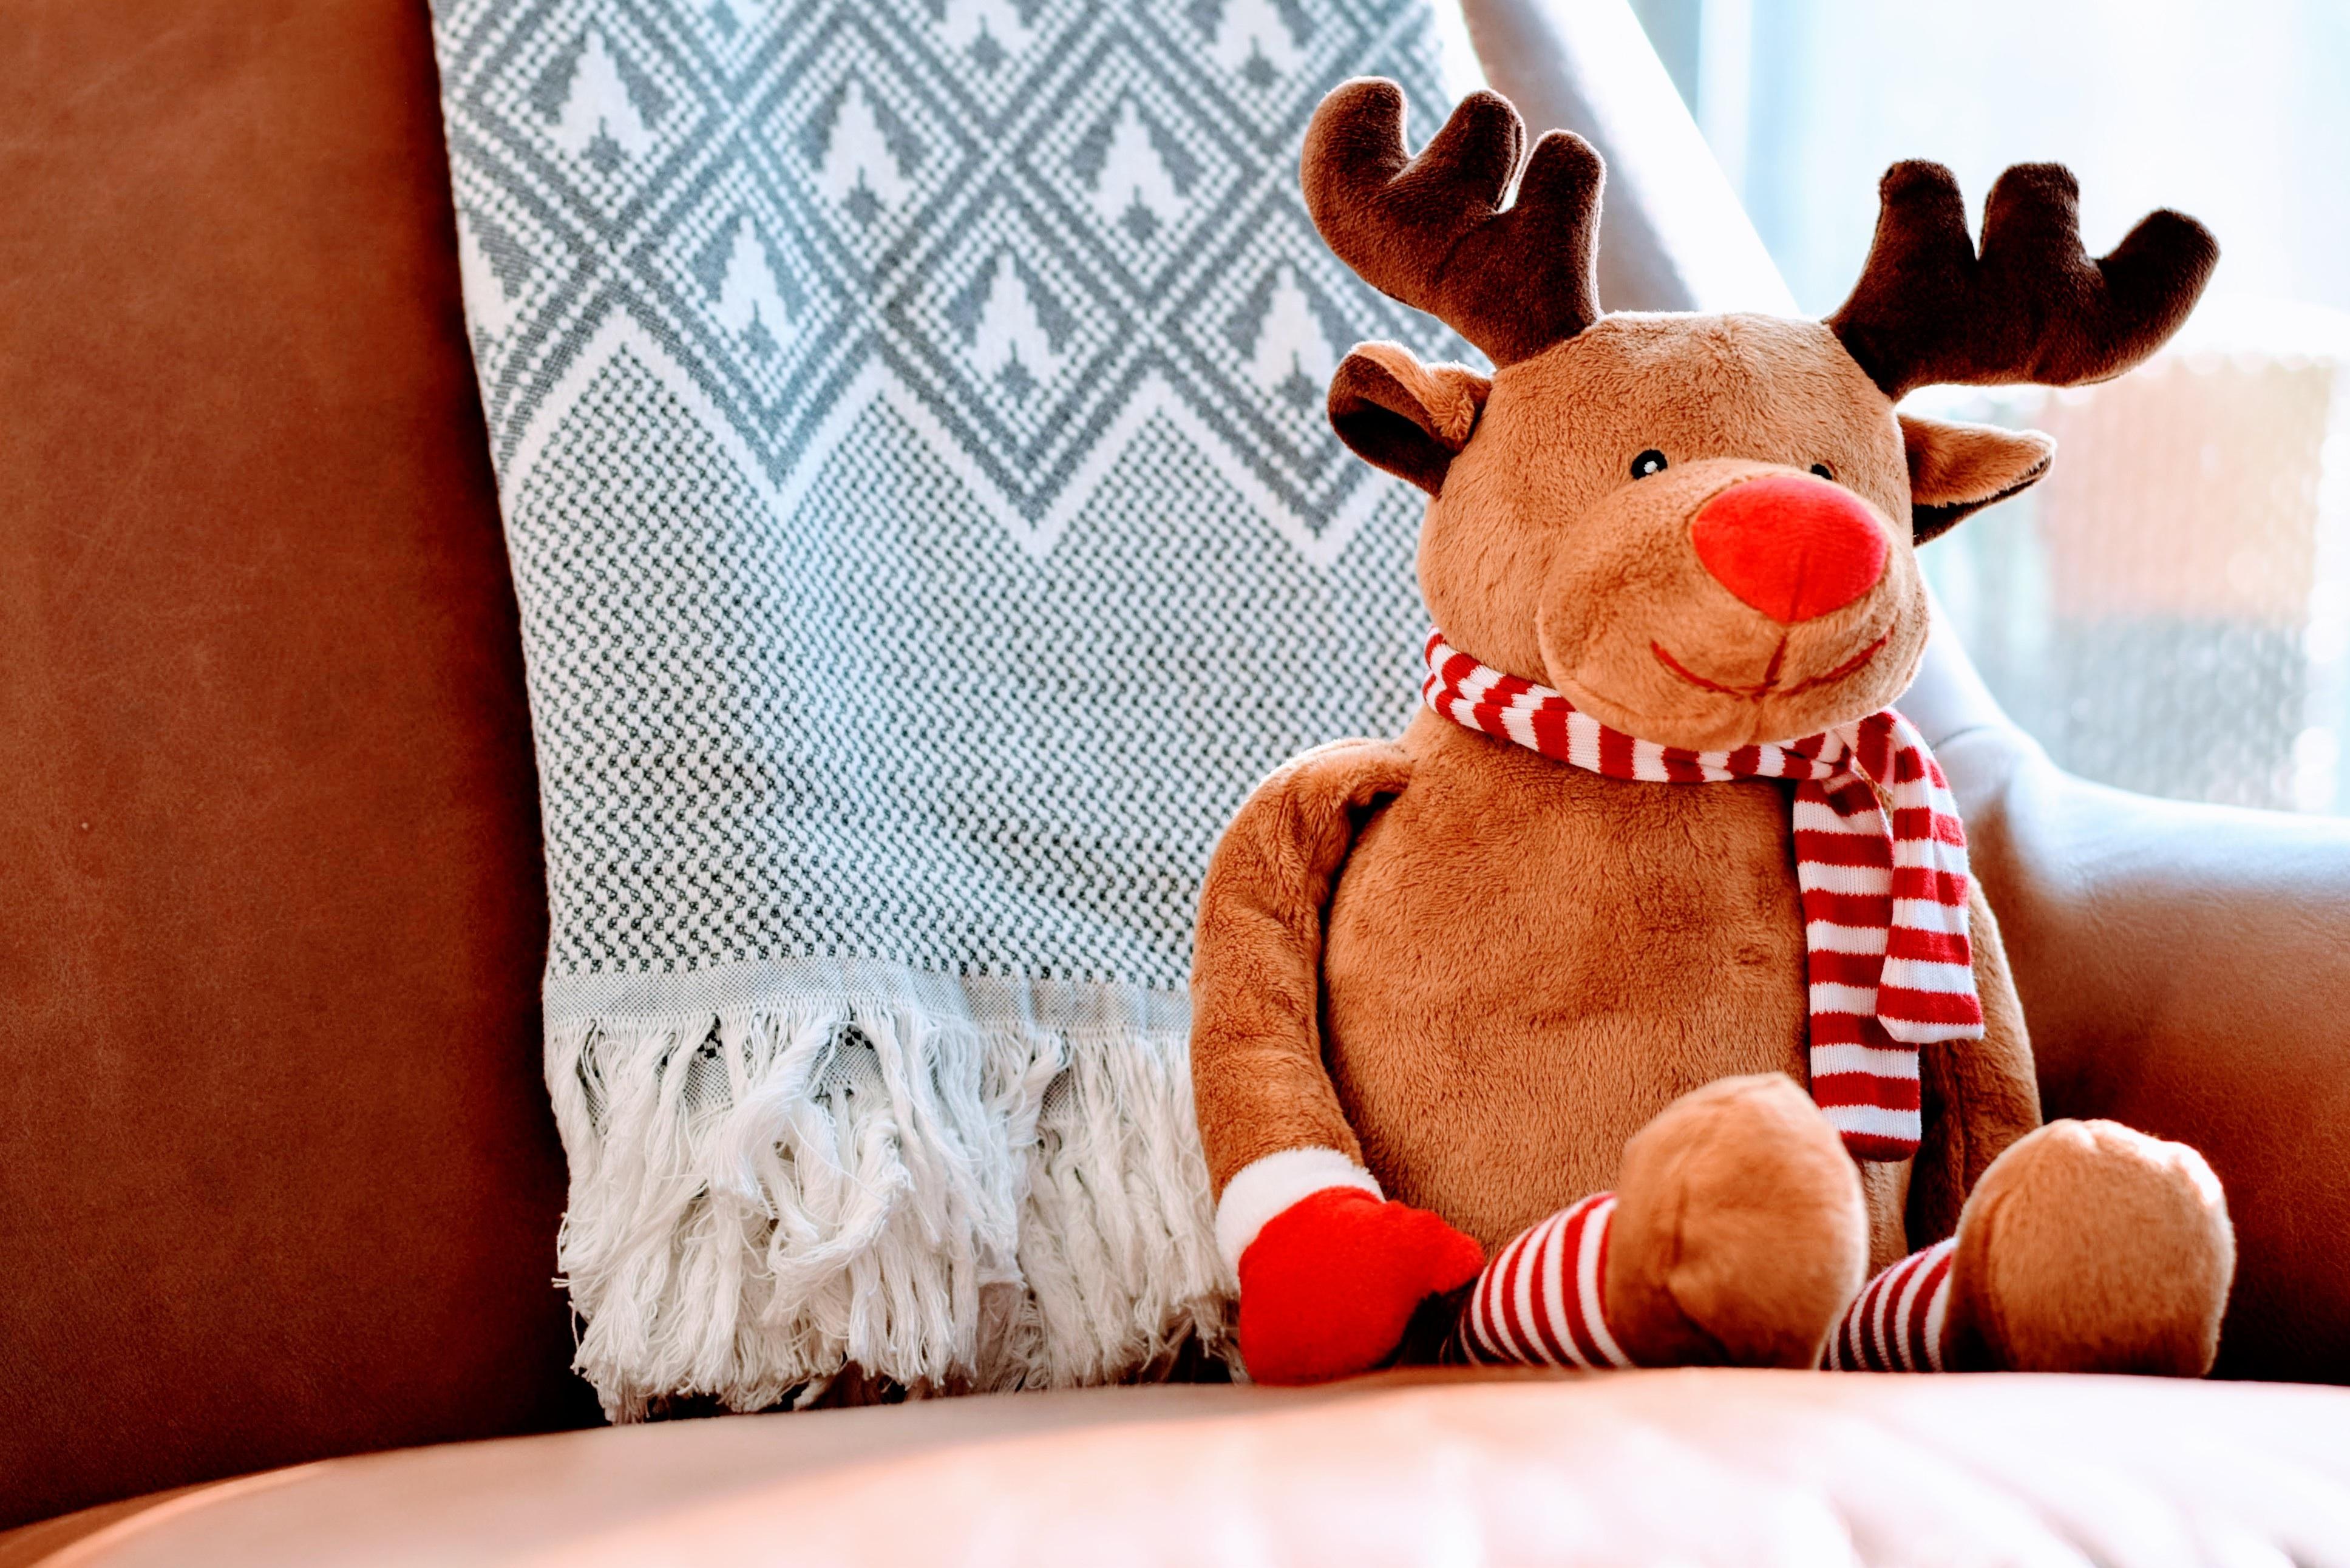 Man Animal Cute Deer Holiday Mammal Cozy Christmas Sofa Toy Indoors Bed  Reindeer Comfort Stuffed Animal